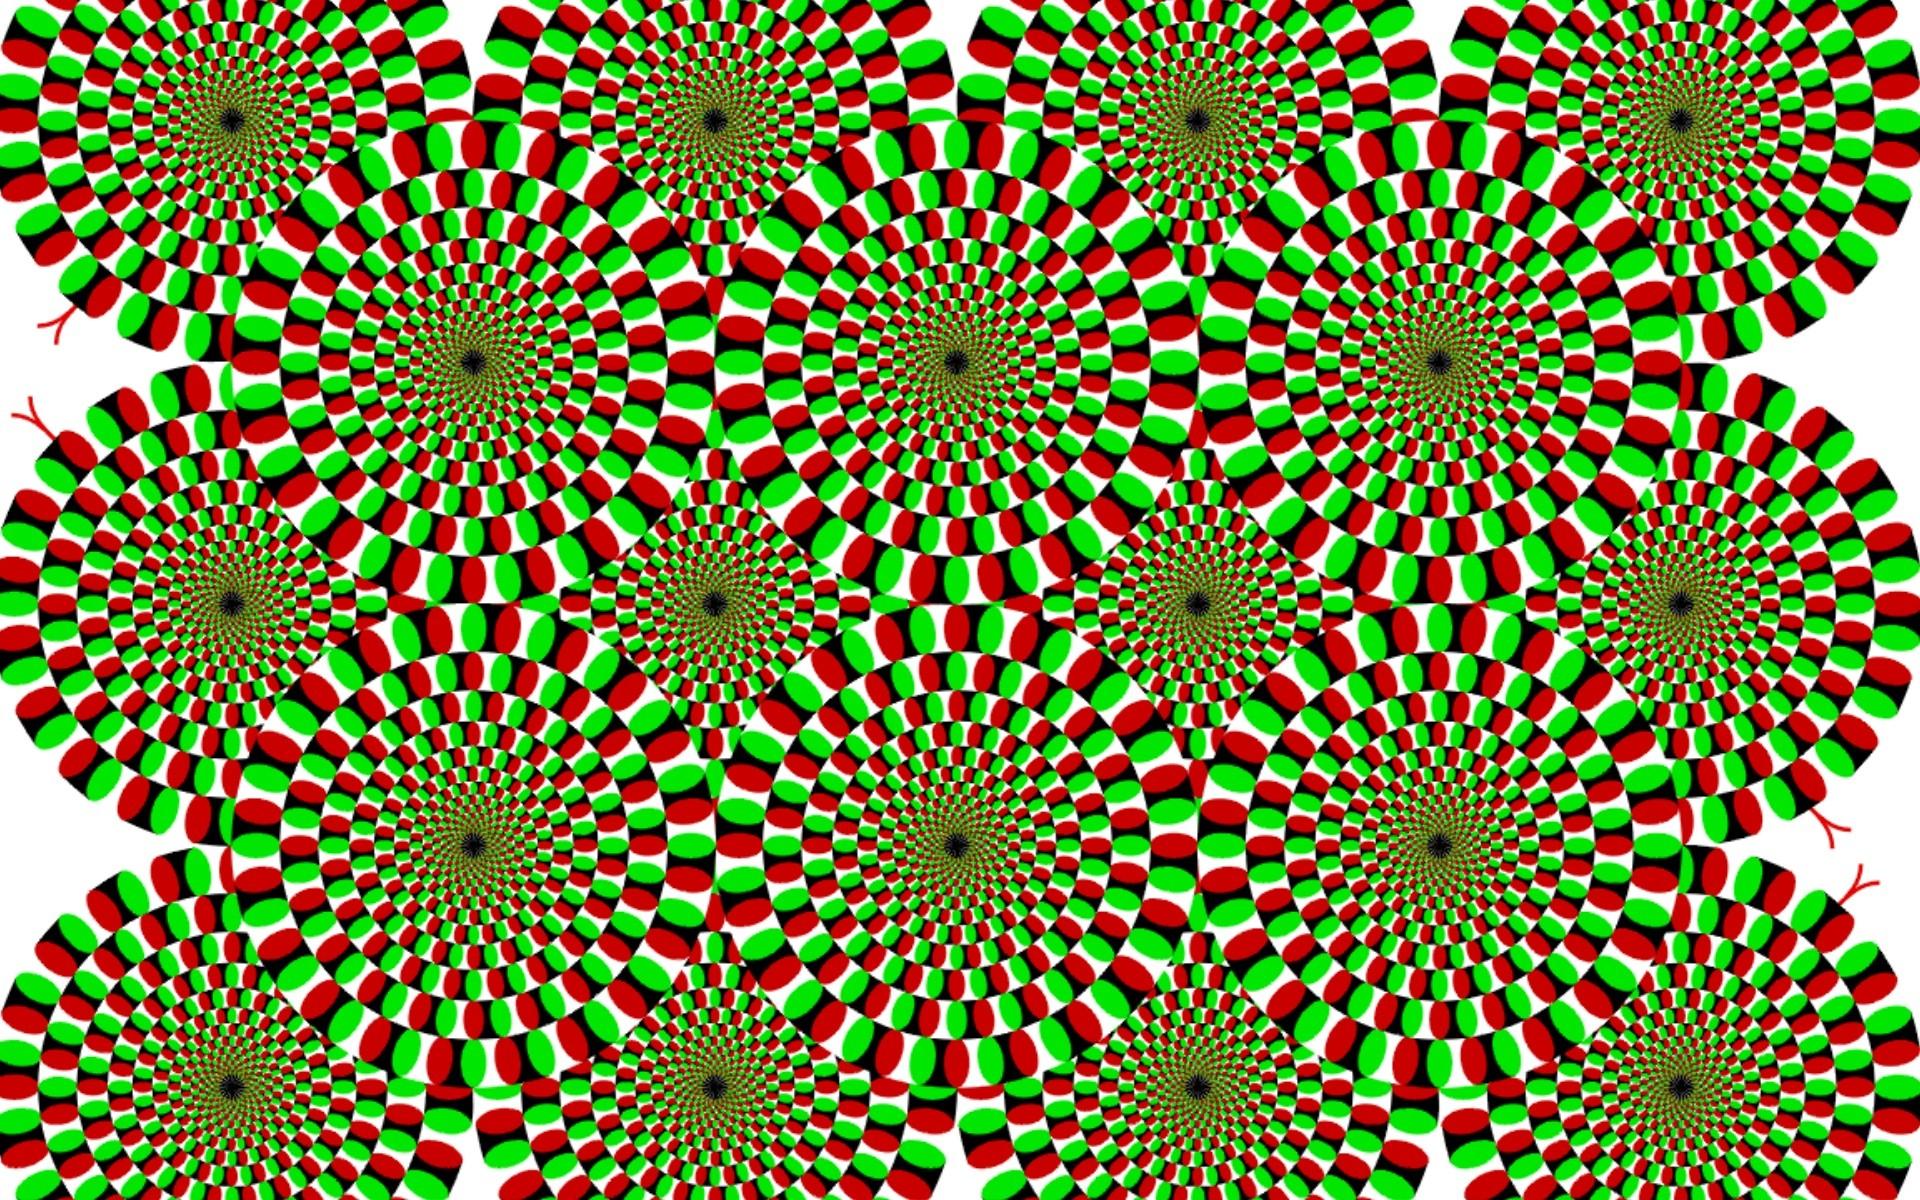 3d illusion wallpaper 58 images - Optical illusion wallpaper hd ...